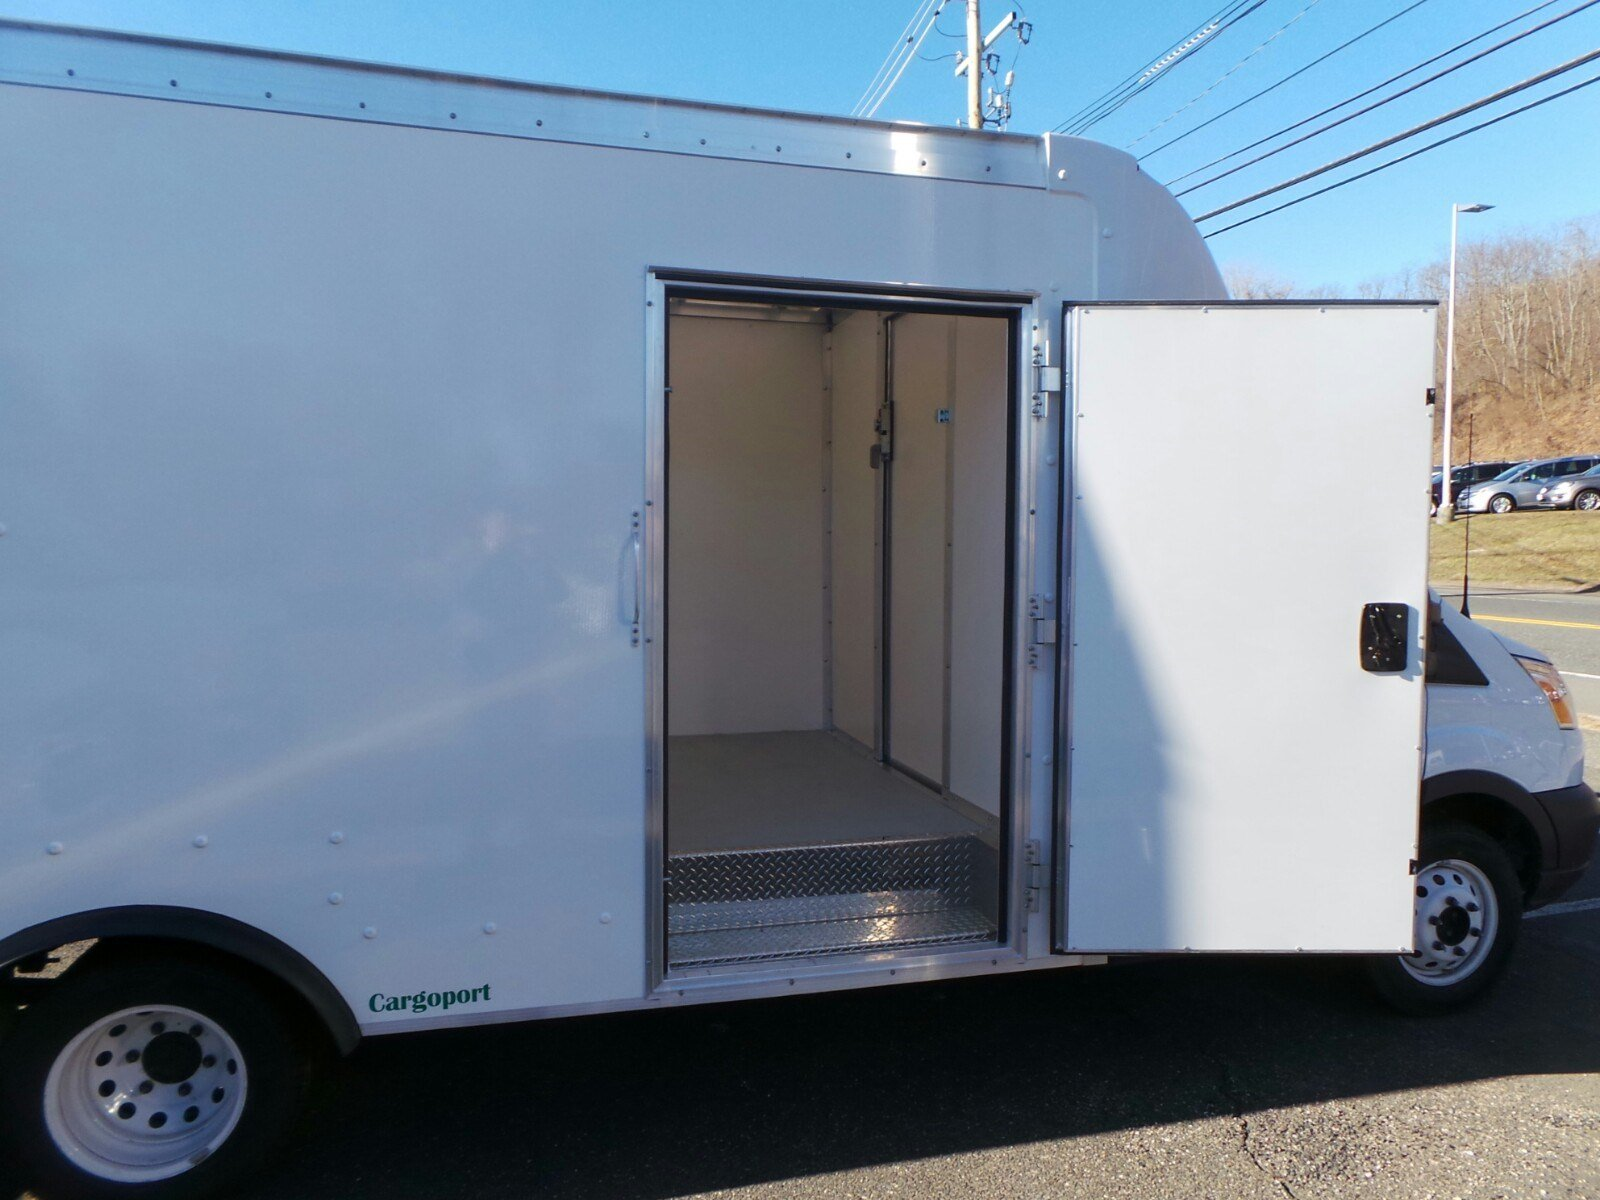 2018 Transit 350 HD DRW 4x2,  Rockport Cargoport Cutaway Van #RT183 - photo 8